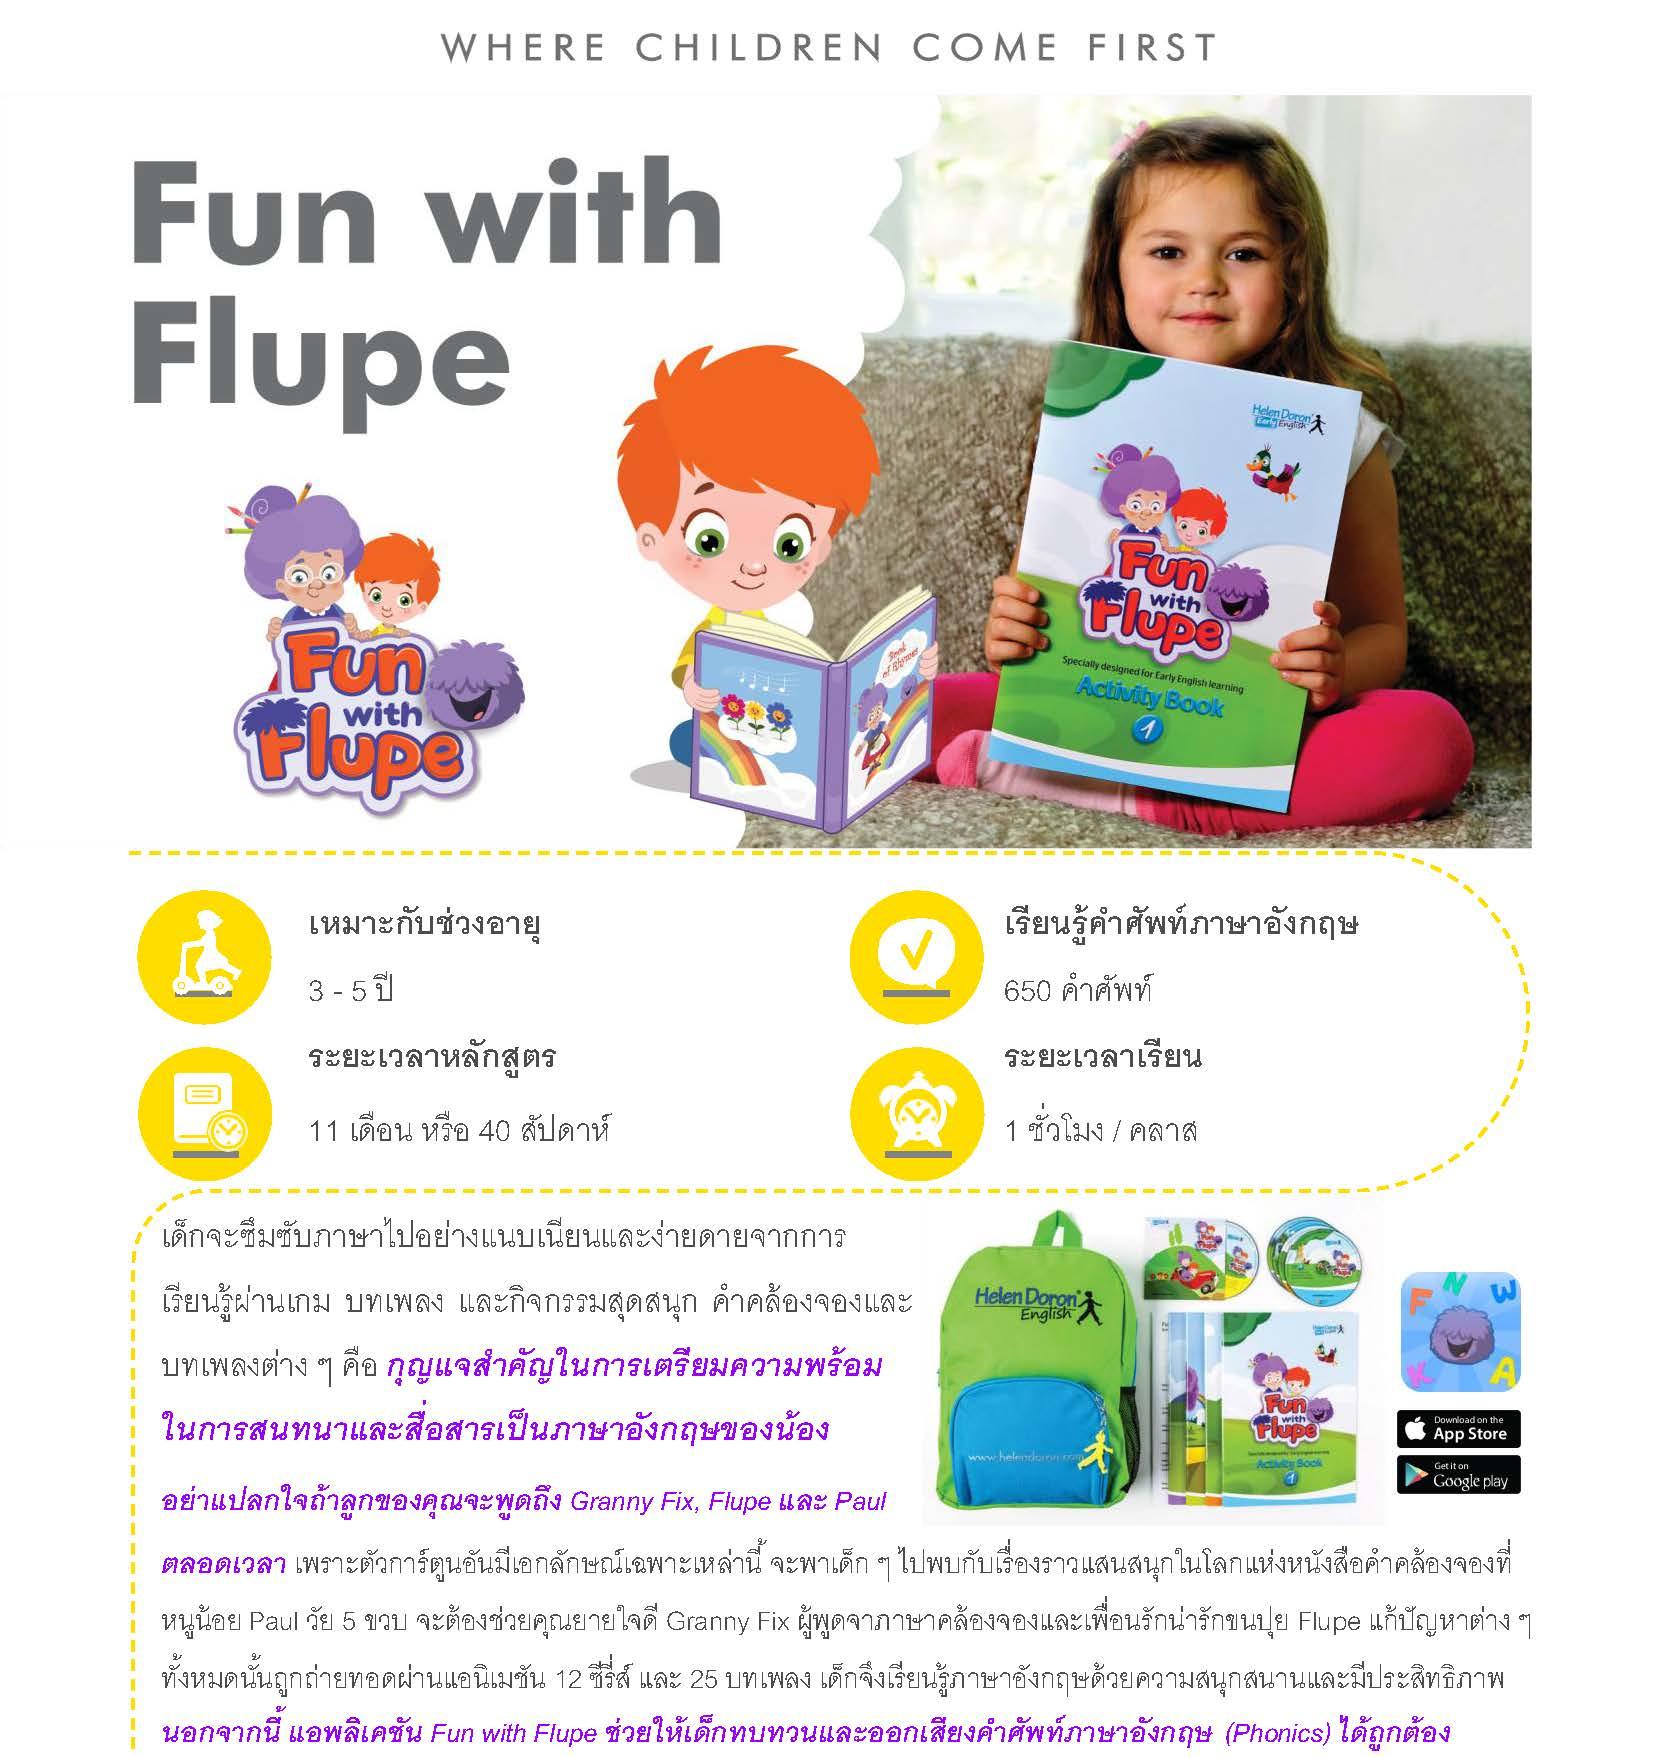 Download - Fun with Flupe สำหรับเด็กเล็ก อายุ 3 – 6 ปี